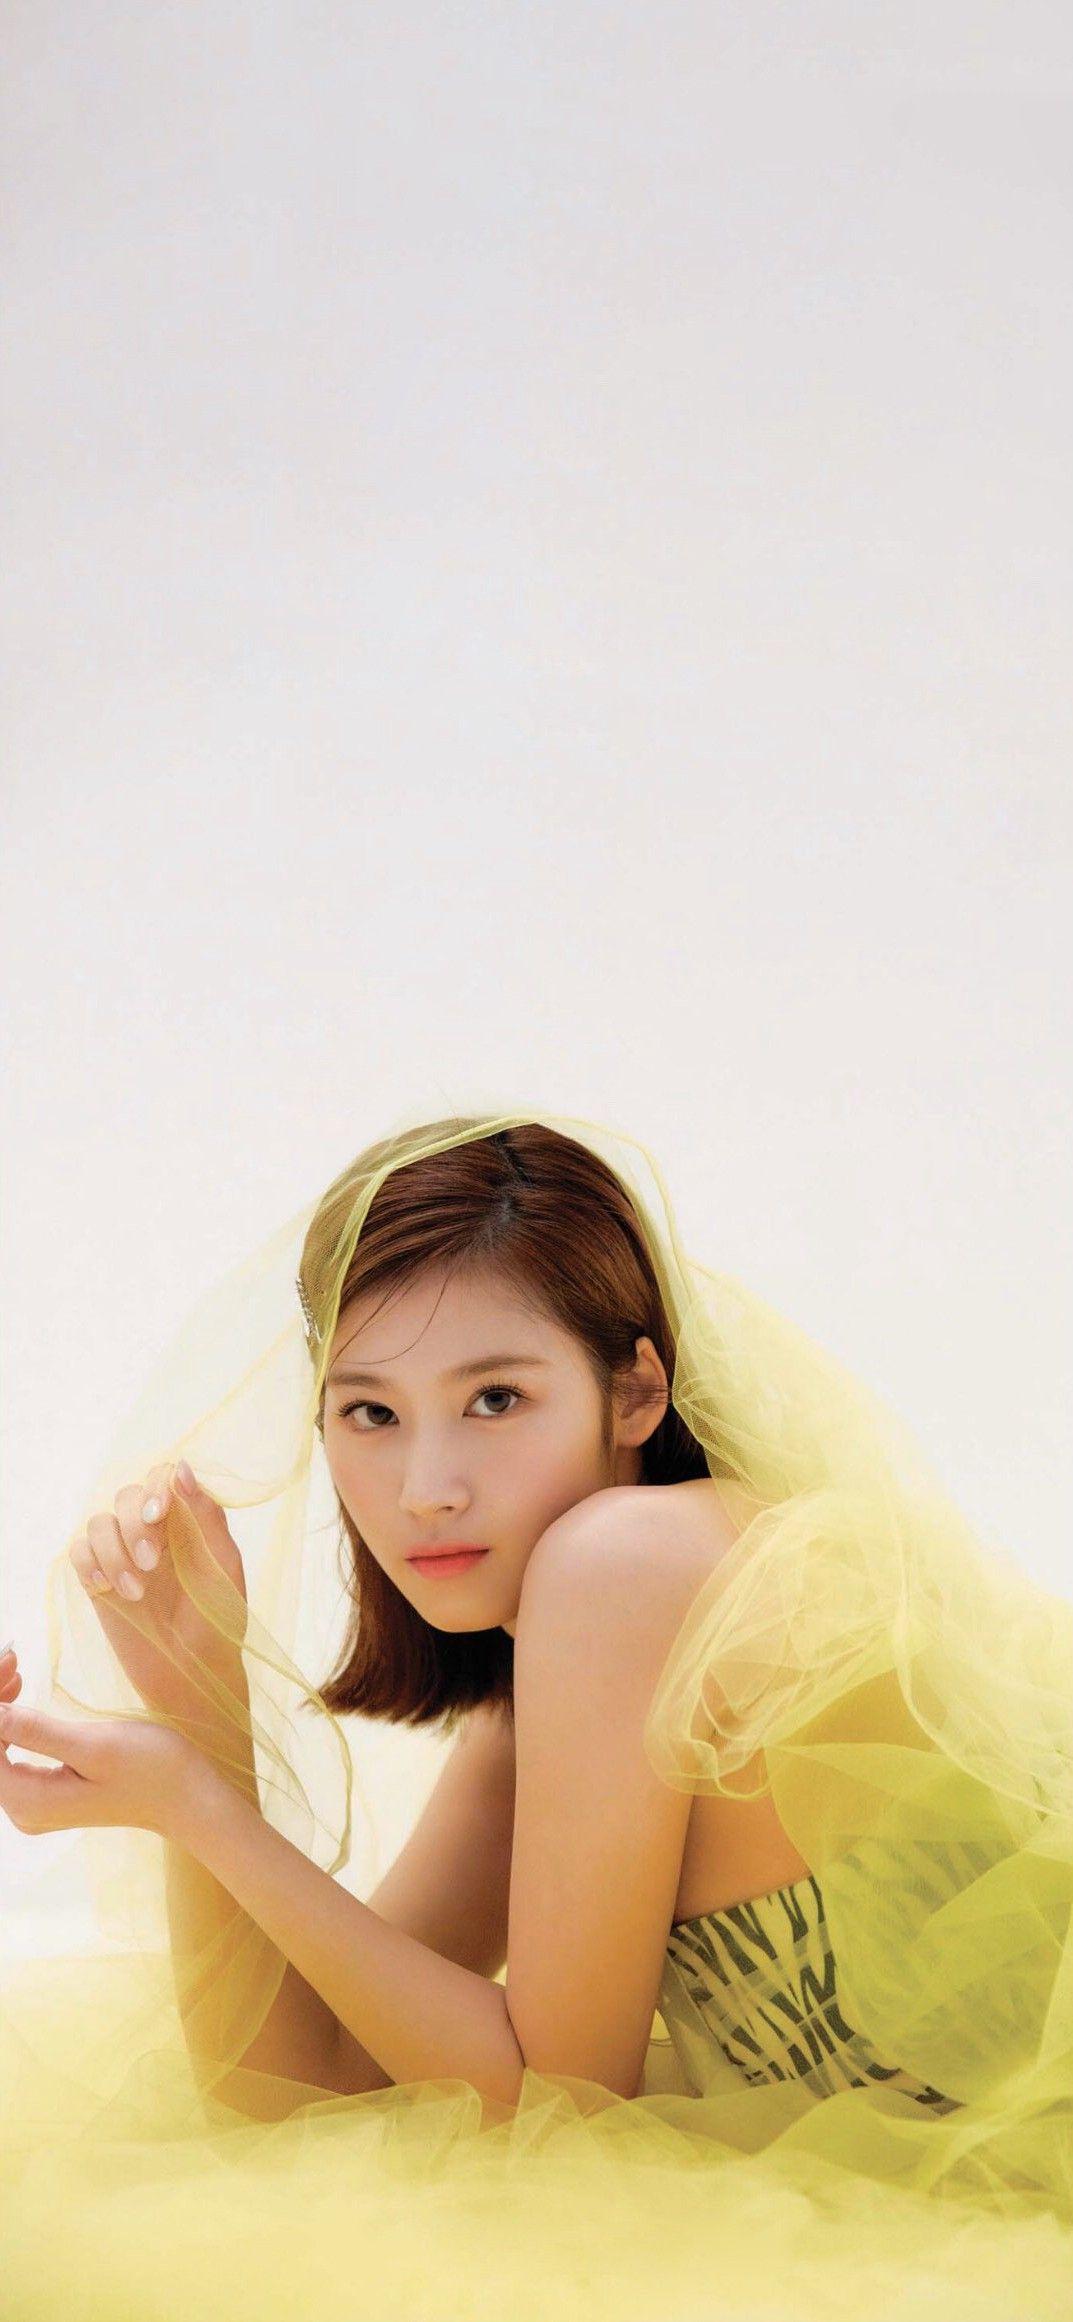 Twice Sana 1st Look Wallpaper Twice Photoshoot Debut Photoshoot Twice Sana